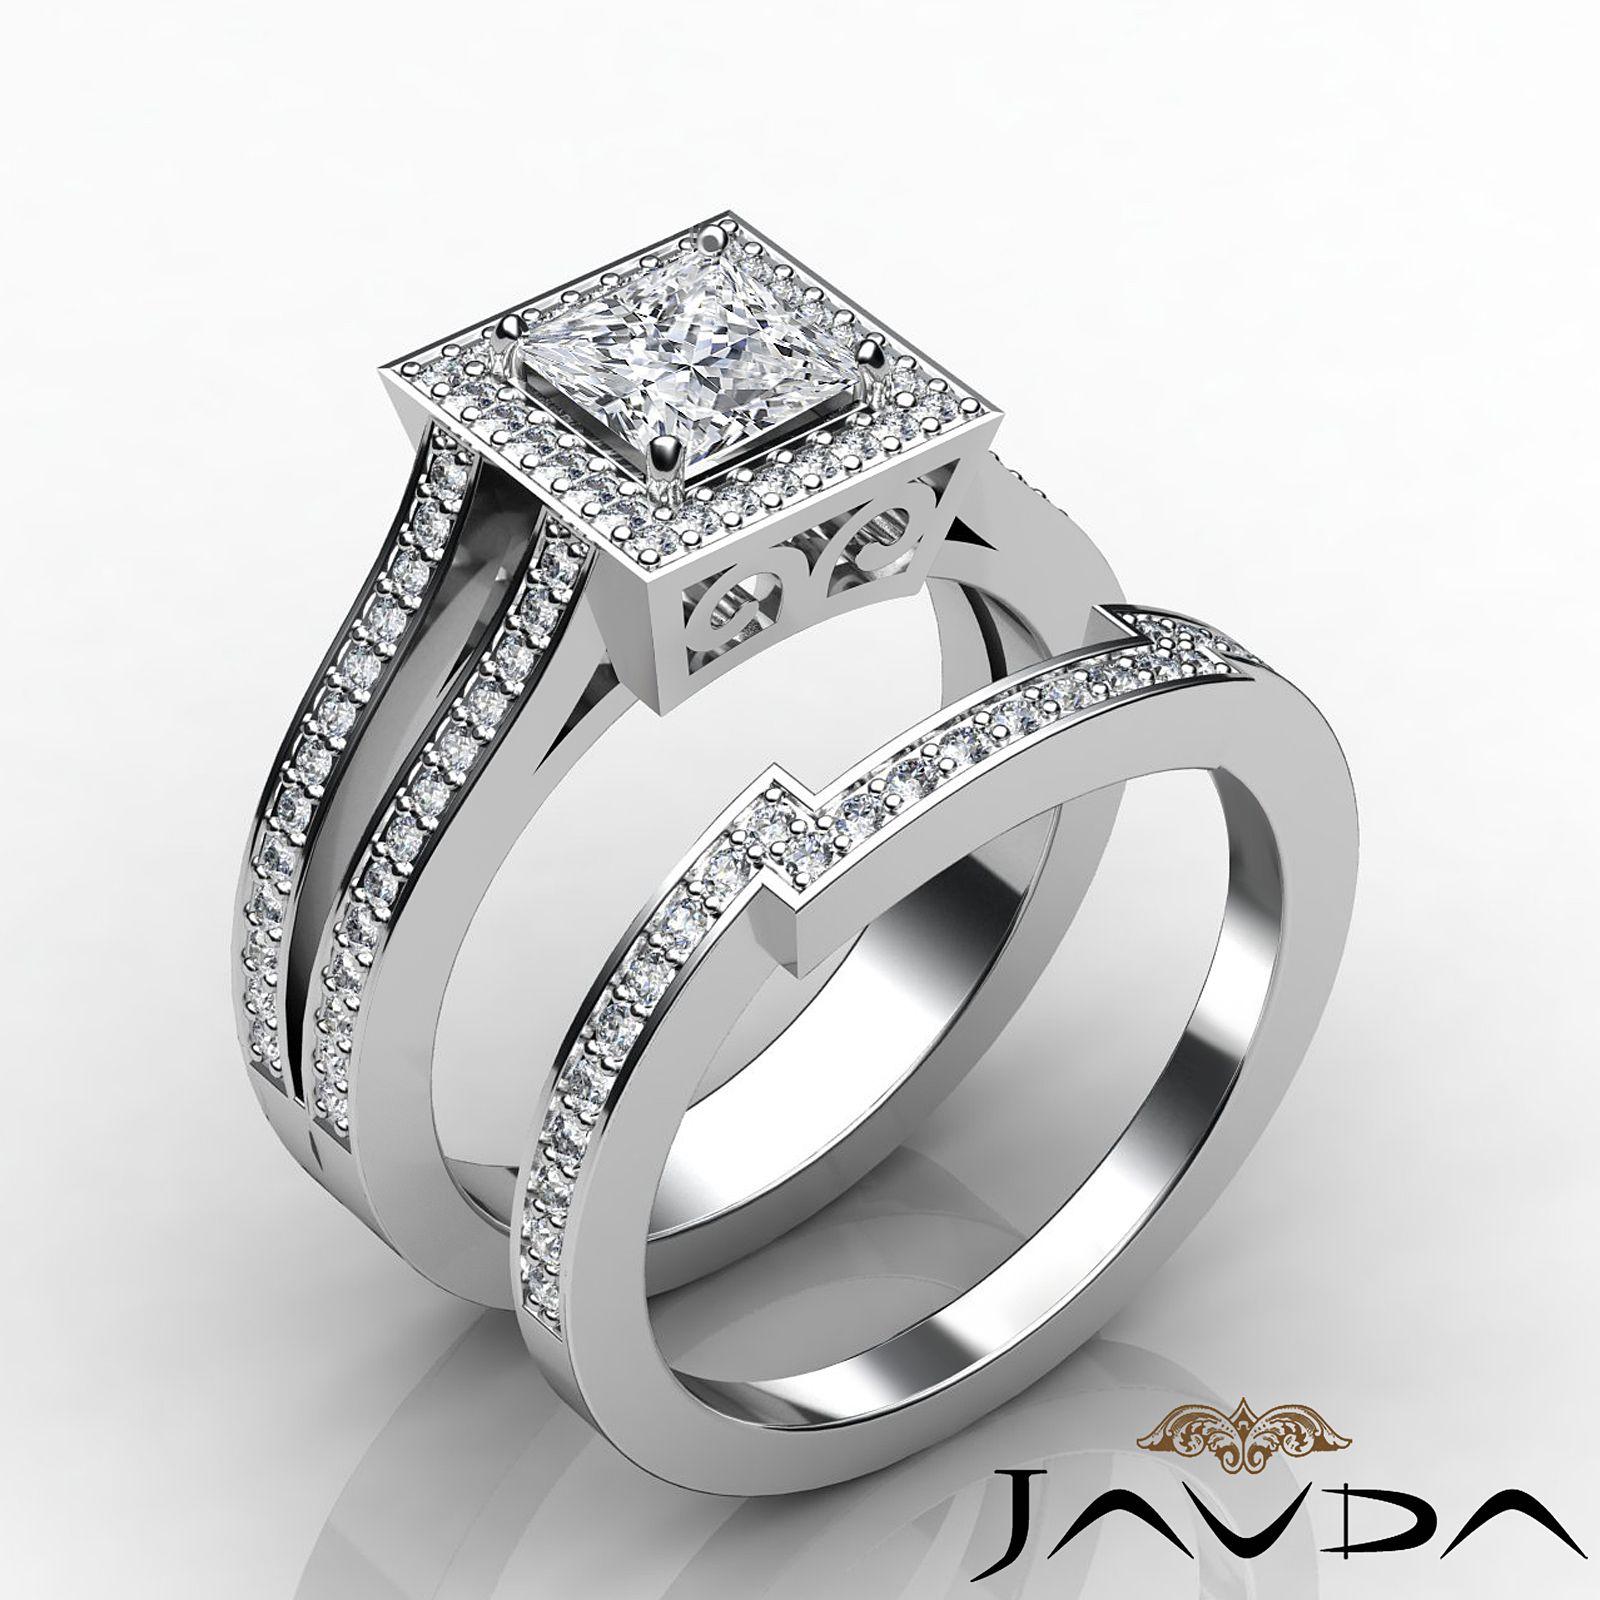 Princess Cut Diamond Engagement GIA G VS2 Bridal Set Ring 14k